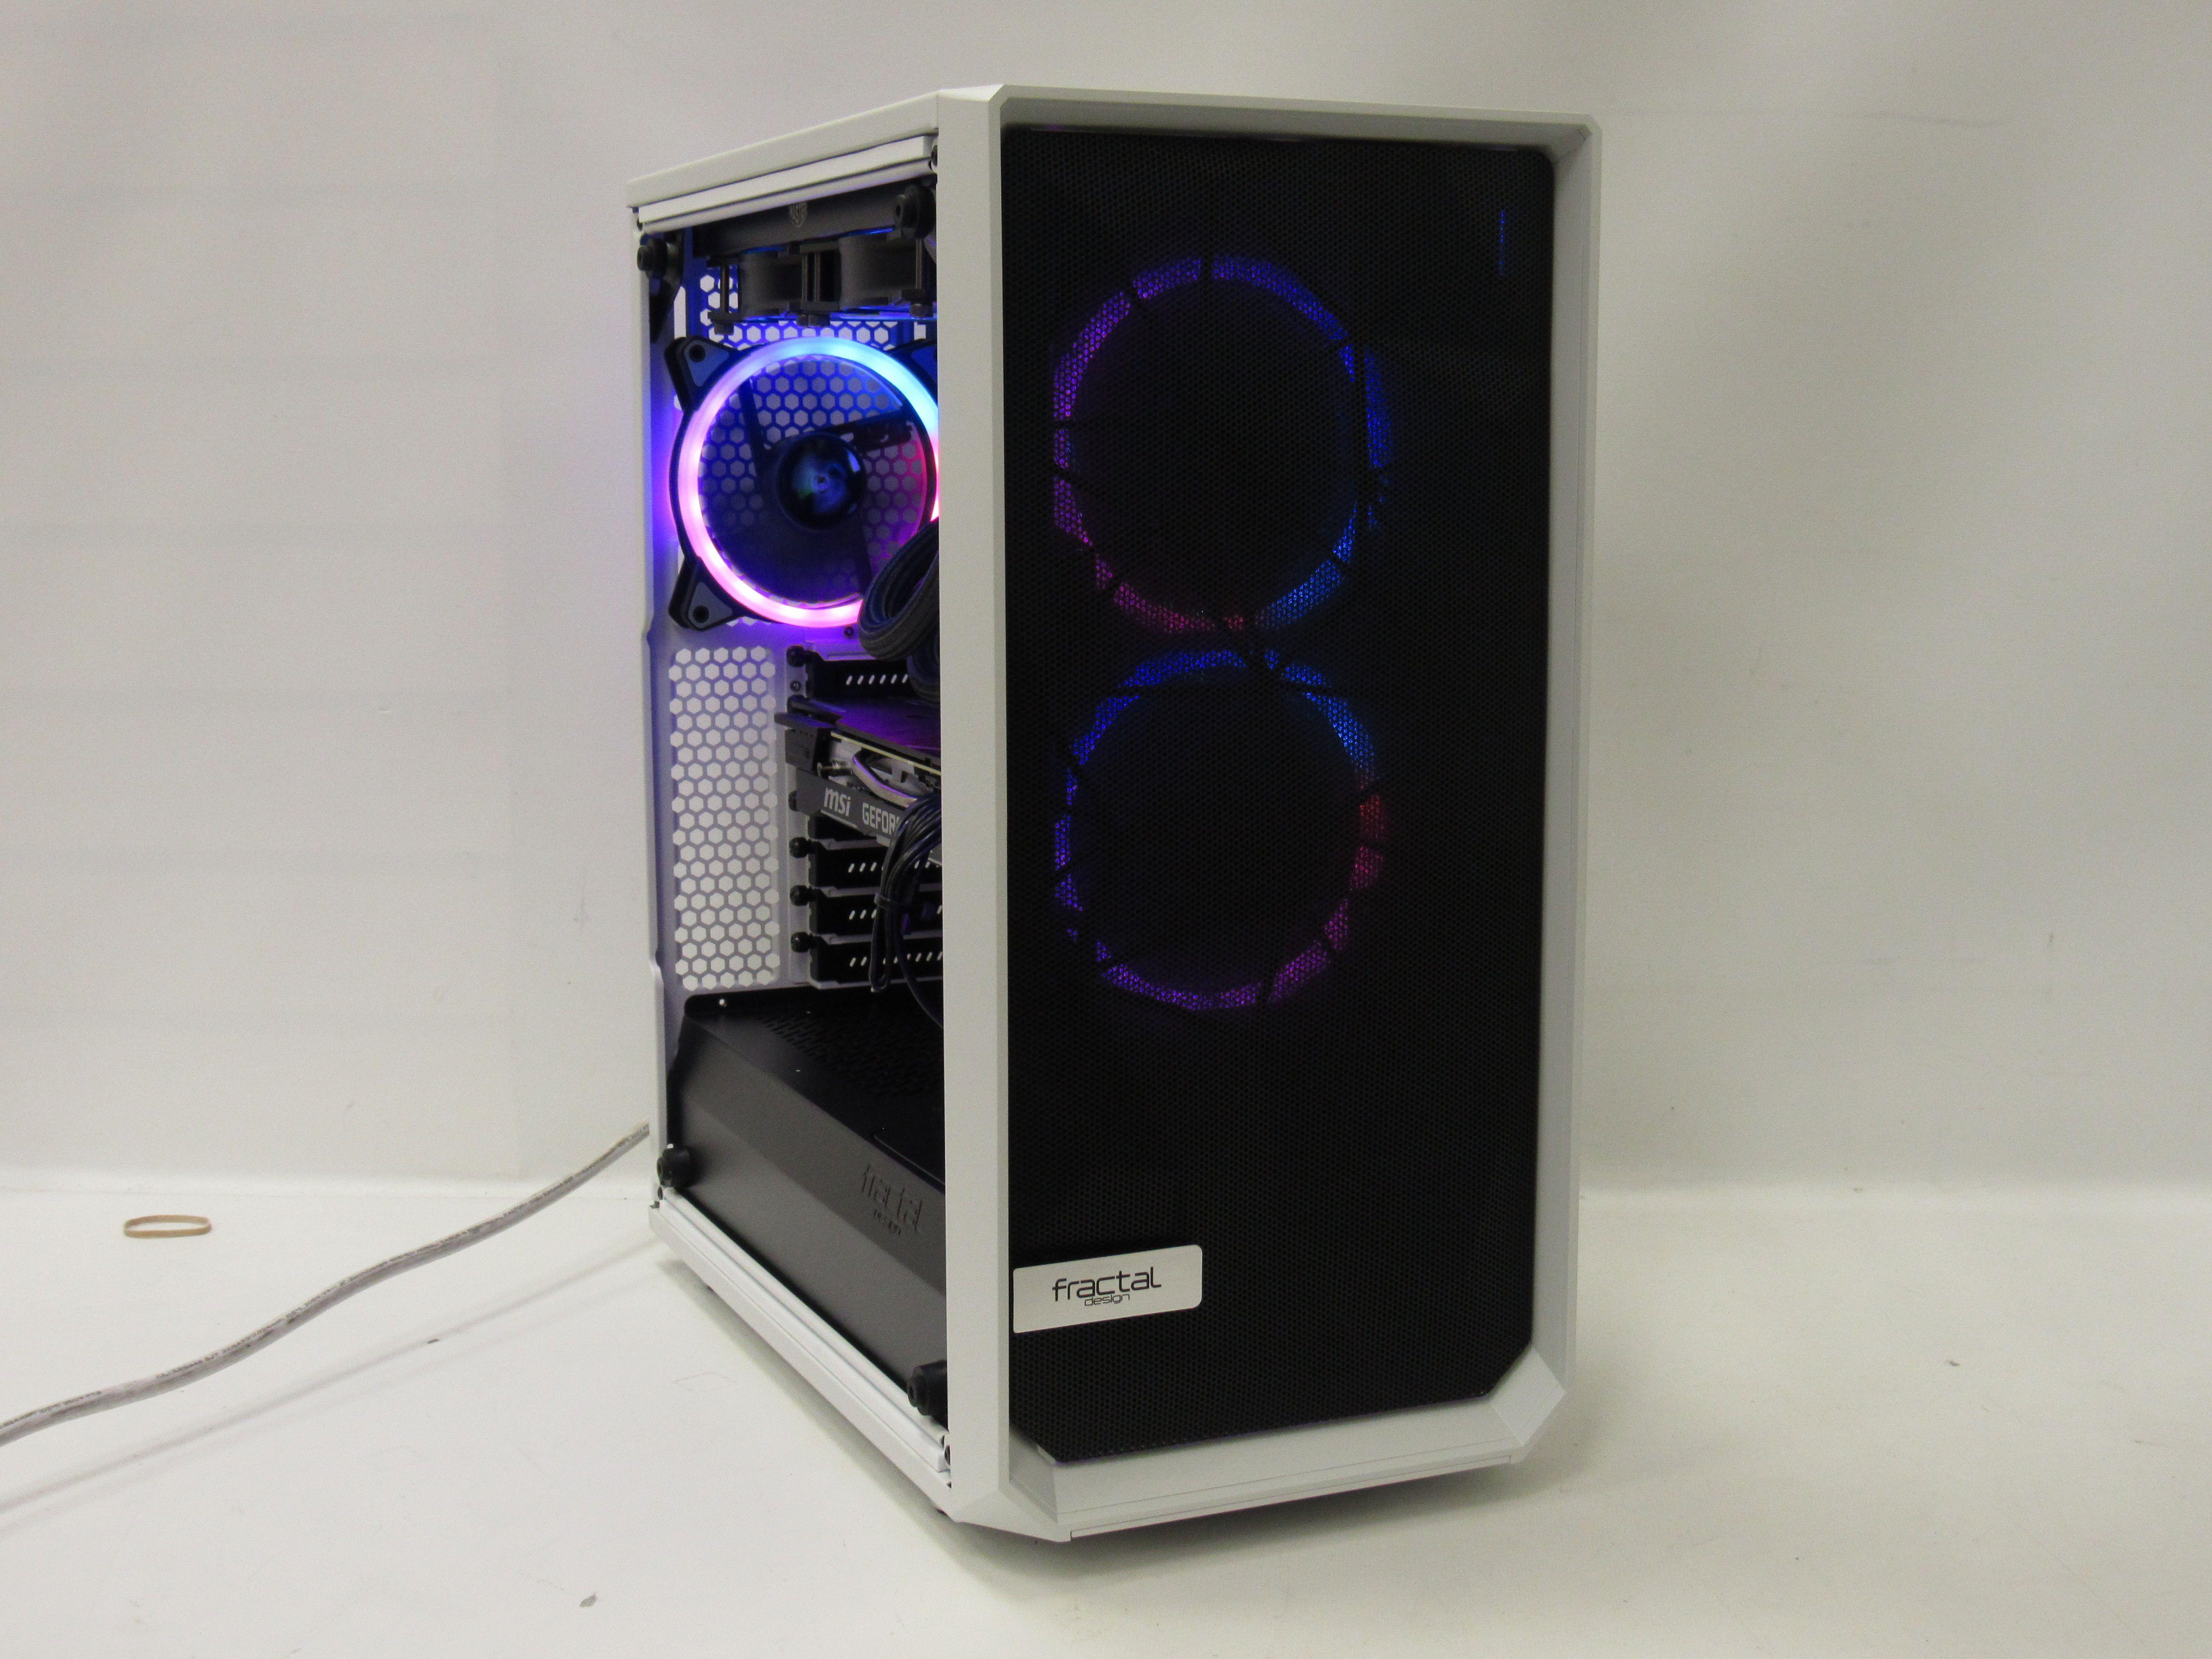 **FINANCING + BRAND NEW ** Custom Build Gaming PC AMD Ryzen 7 3700X 16GB DDR4 RAM 500GB SSD RTX 2070 Super (8GB) Graphics Card Windows 10